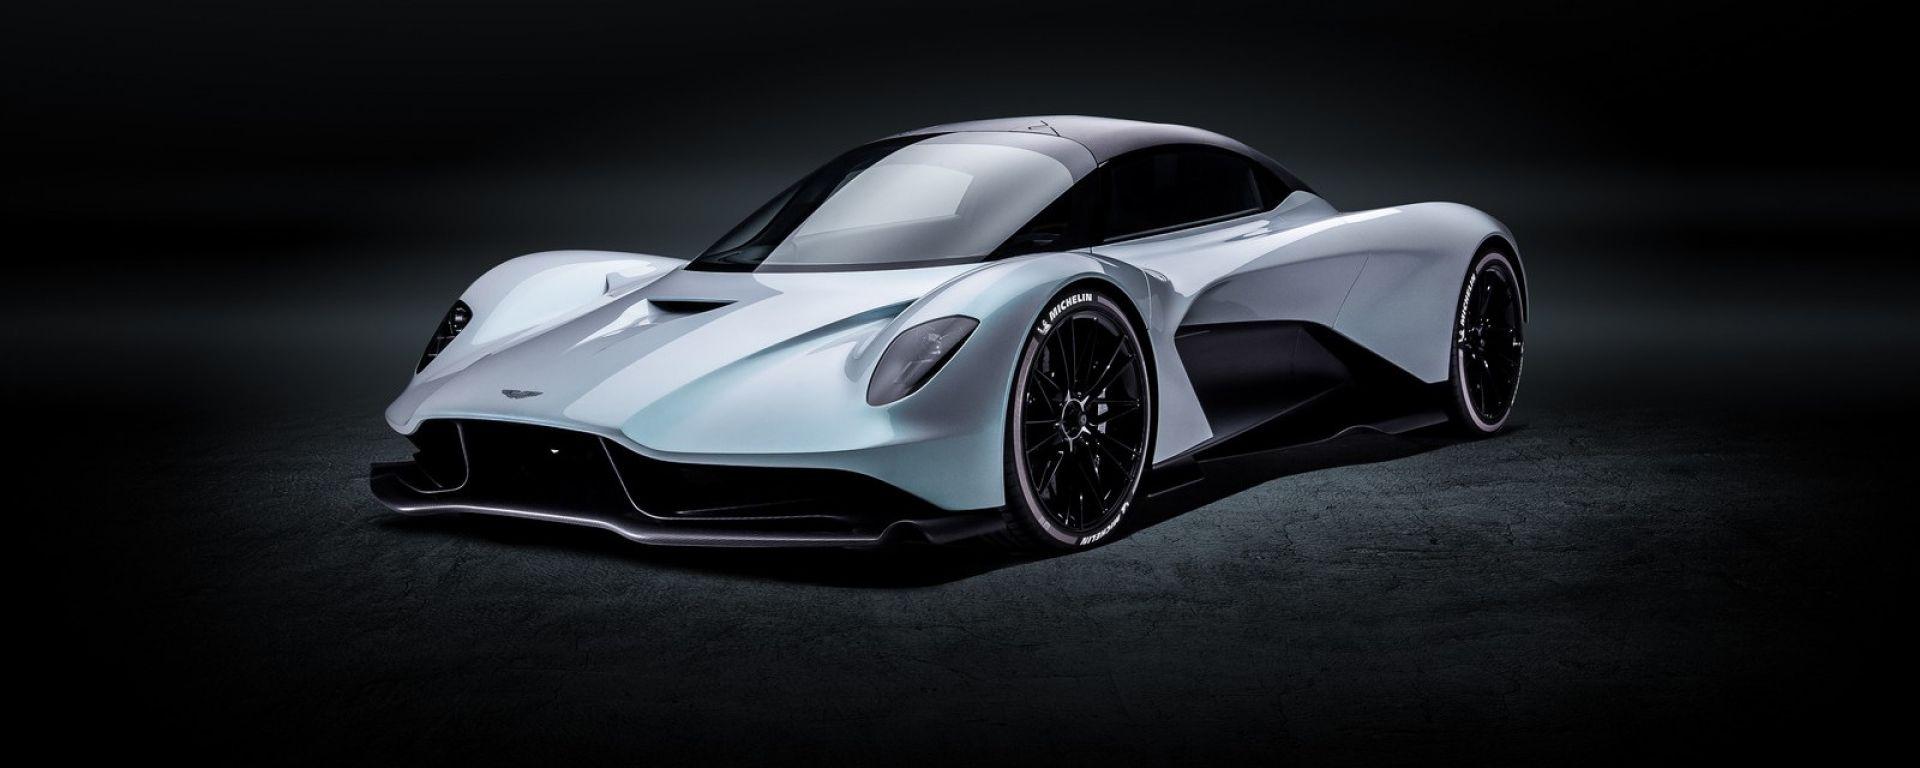 Aston Martin Valhalla 2022: la supercar inglese